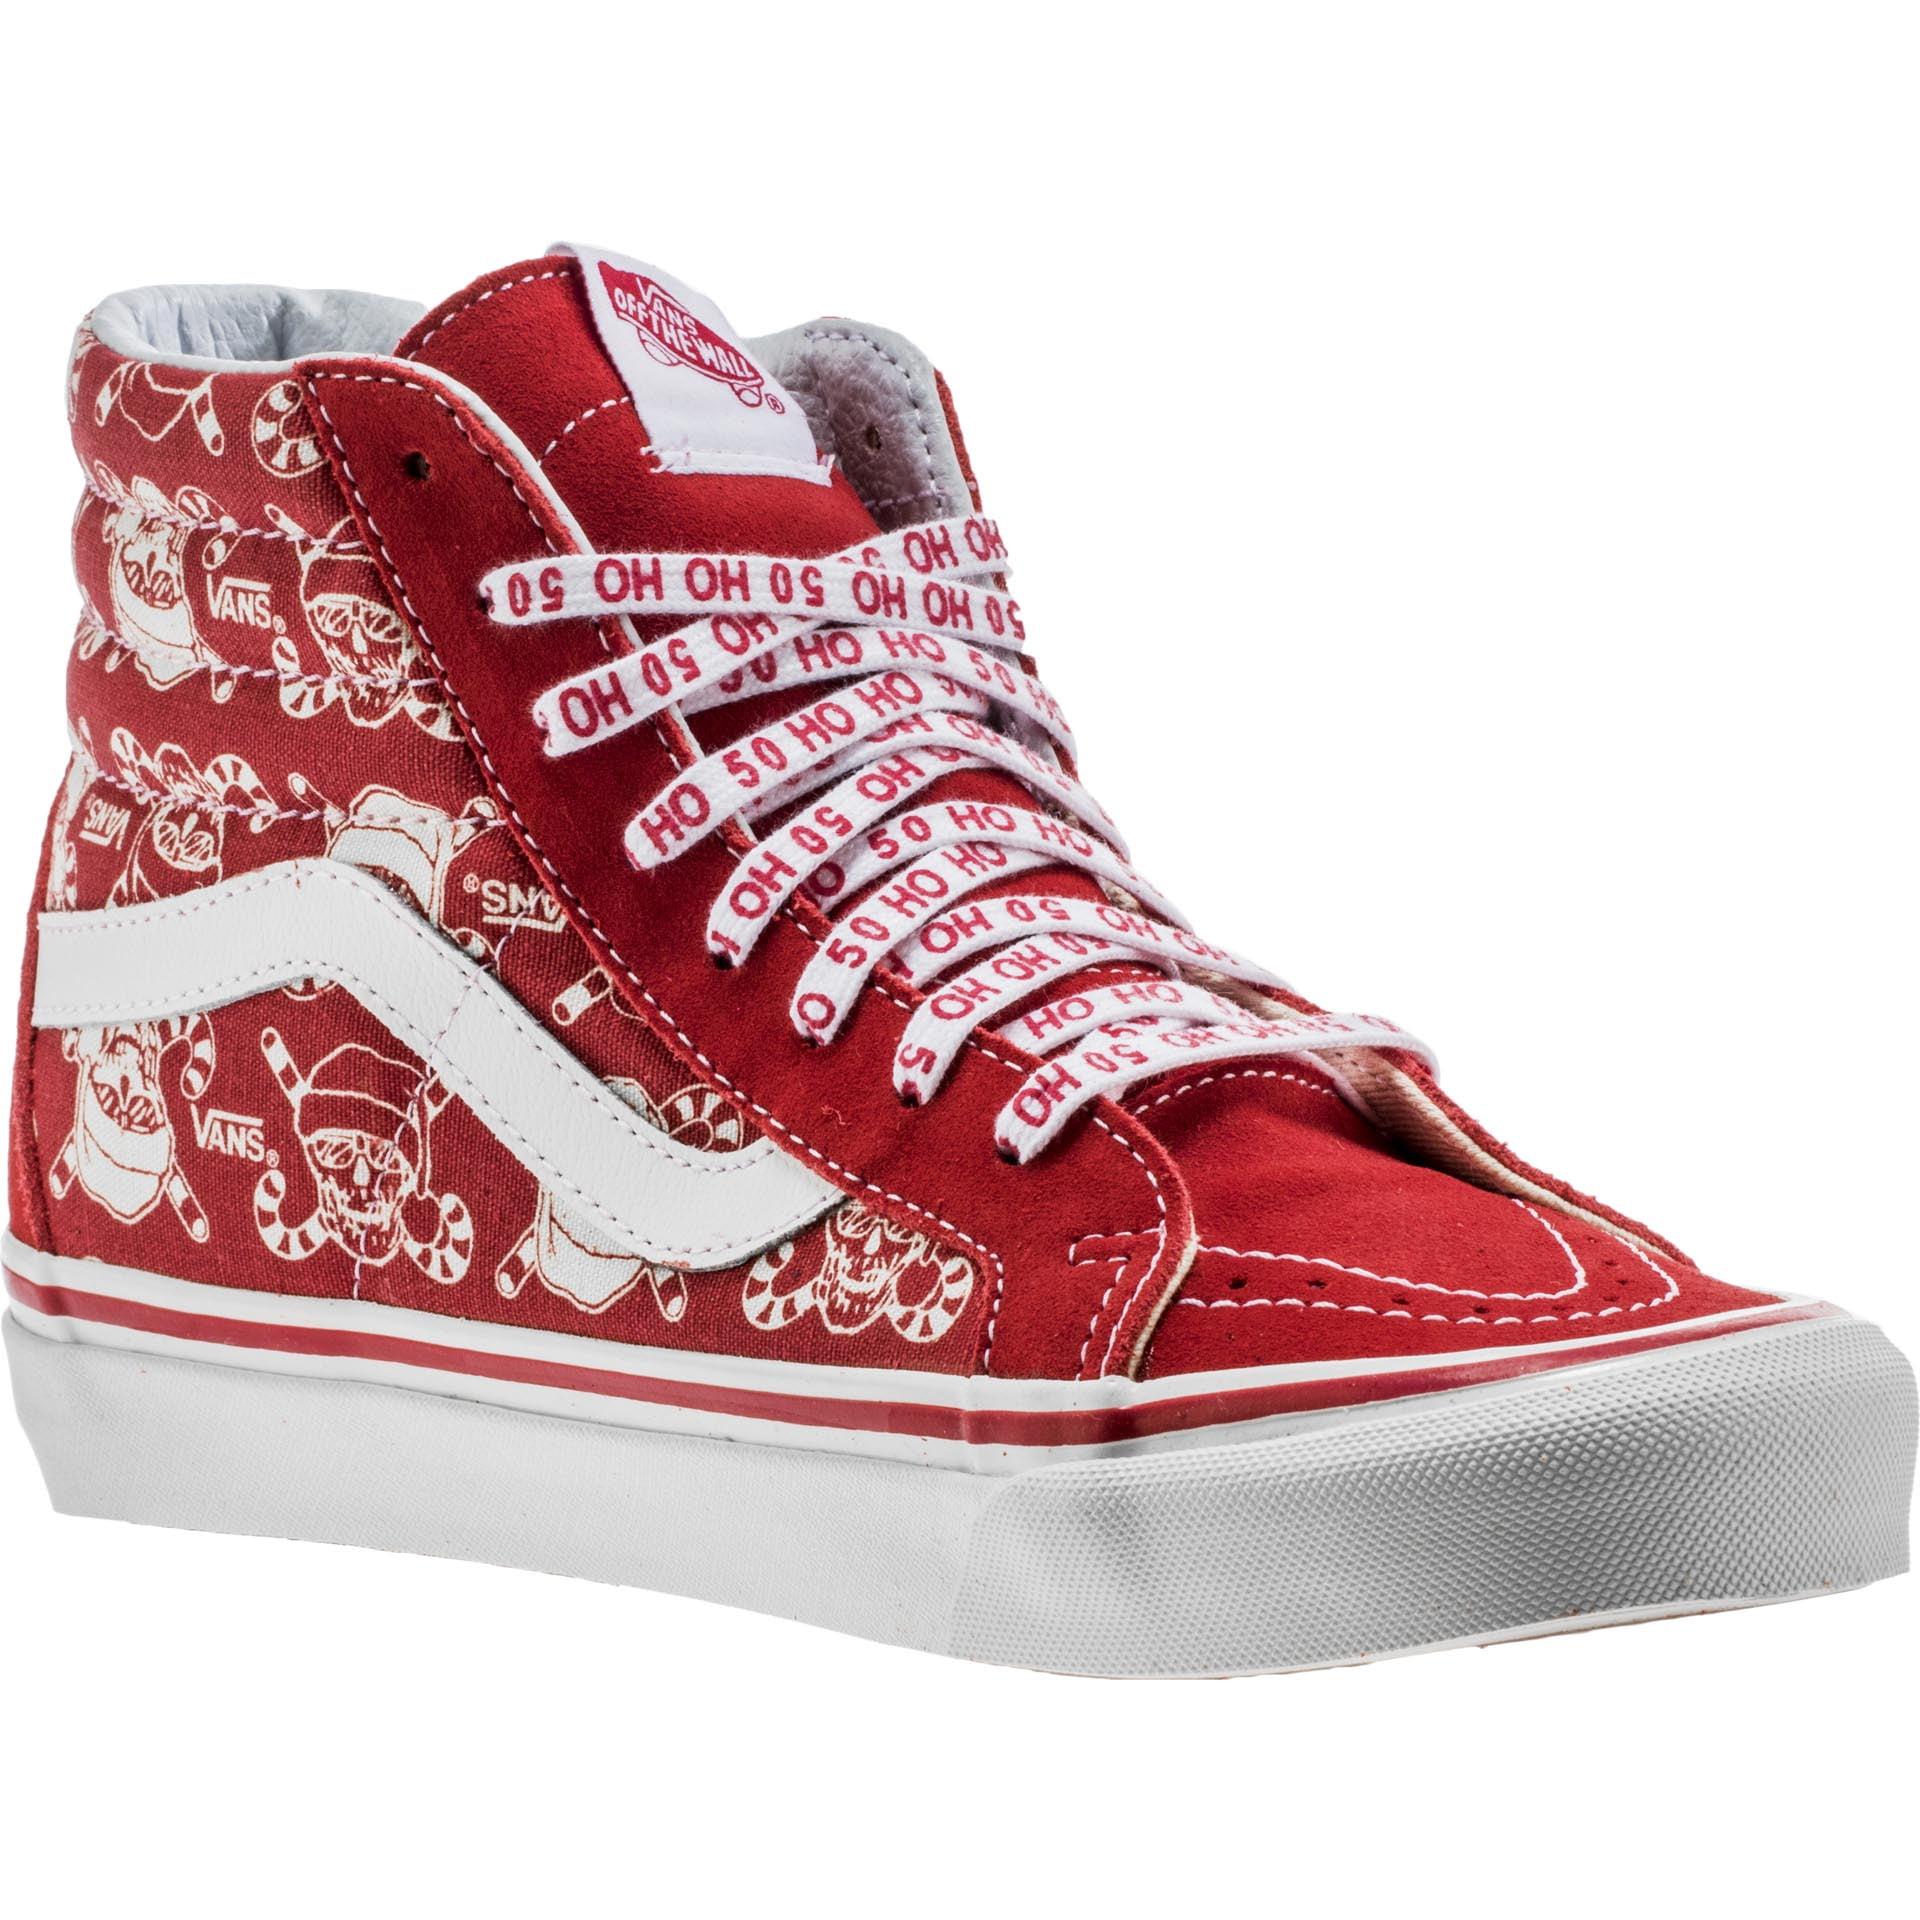 ba8c1c1776 Vans - Vans SK8 Hi 38 Reissue 50th Stv Pirate Santa Red Men s Skate Shoes  Size 13 - Walmart.com